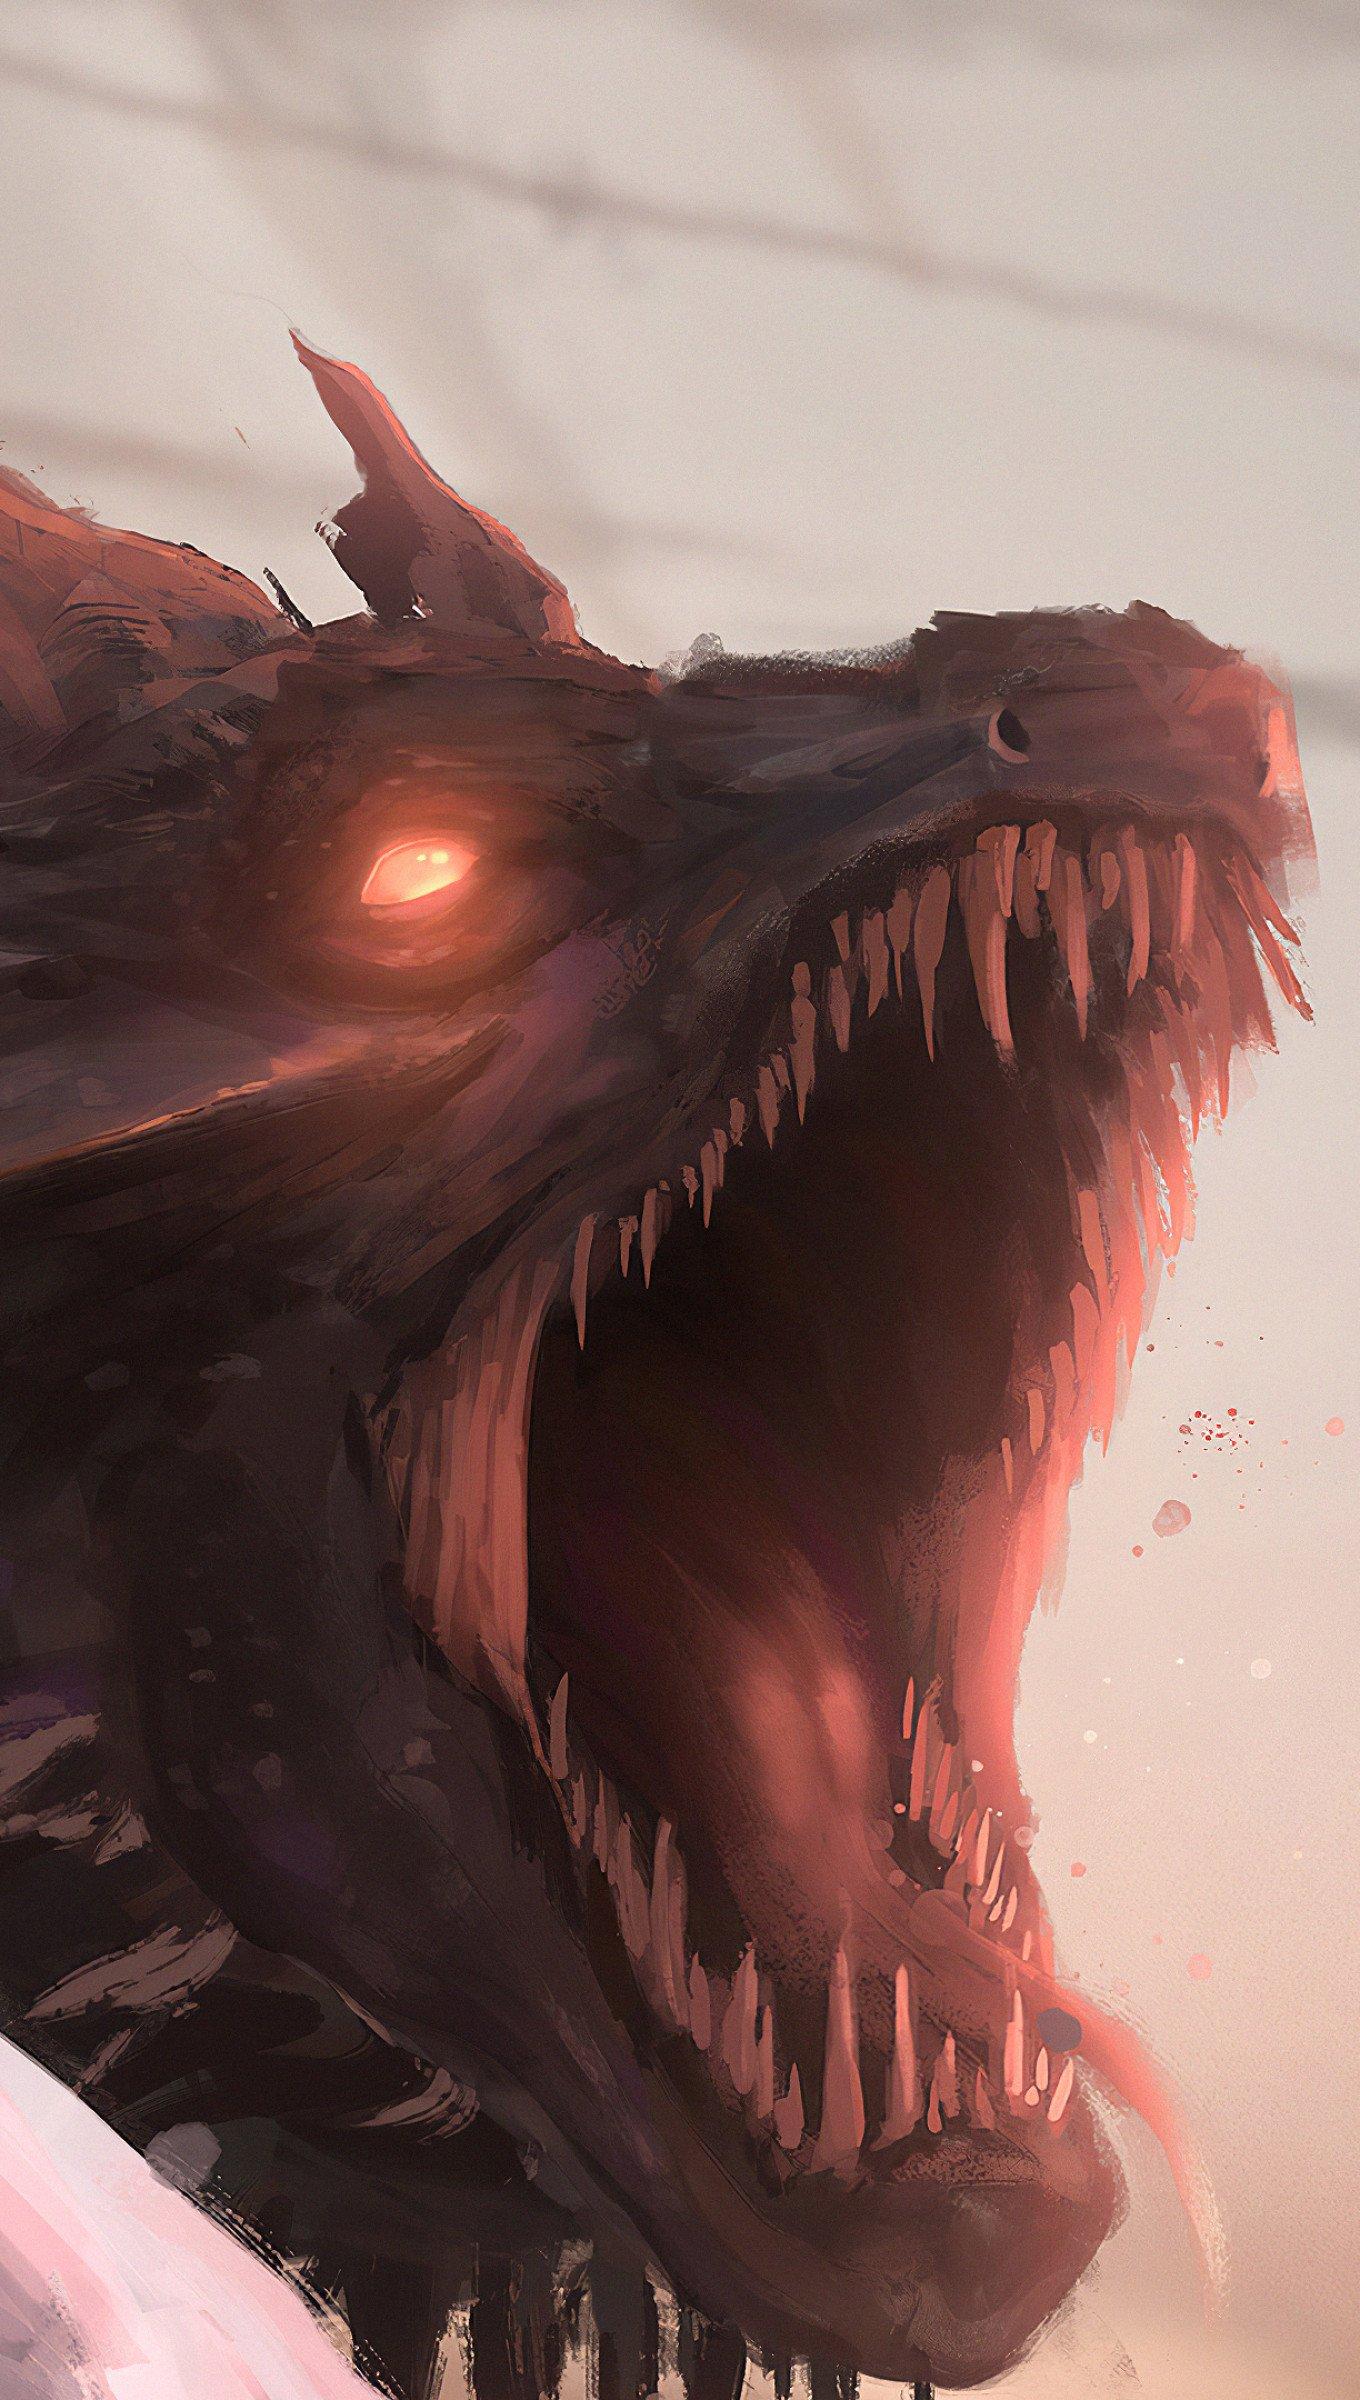 Wallpaper Daenerys Targaryen with dragon Fanart Vertical